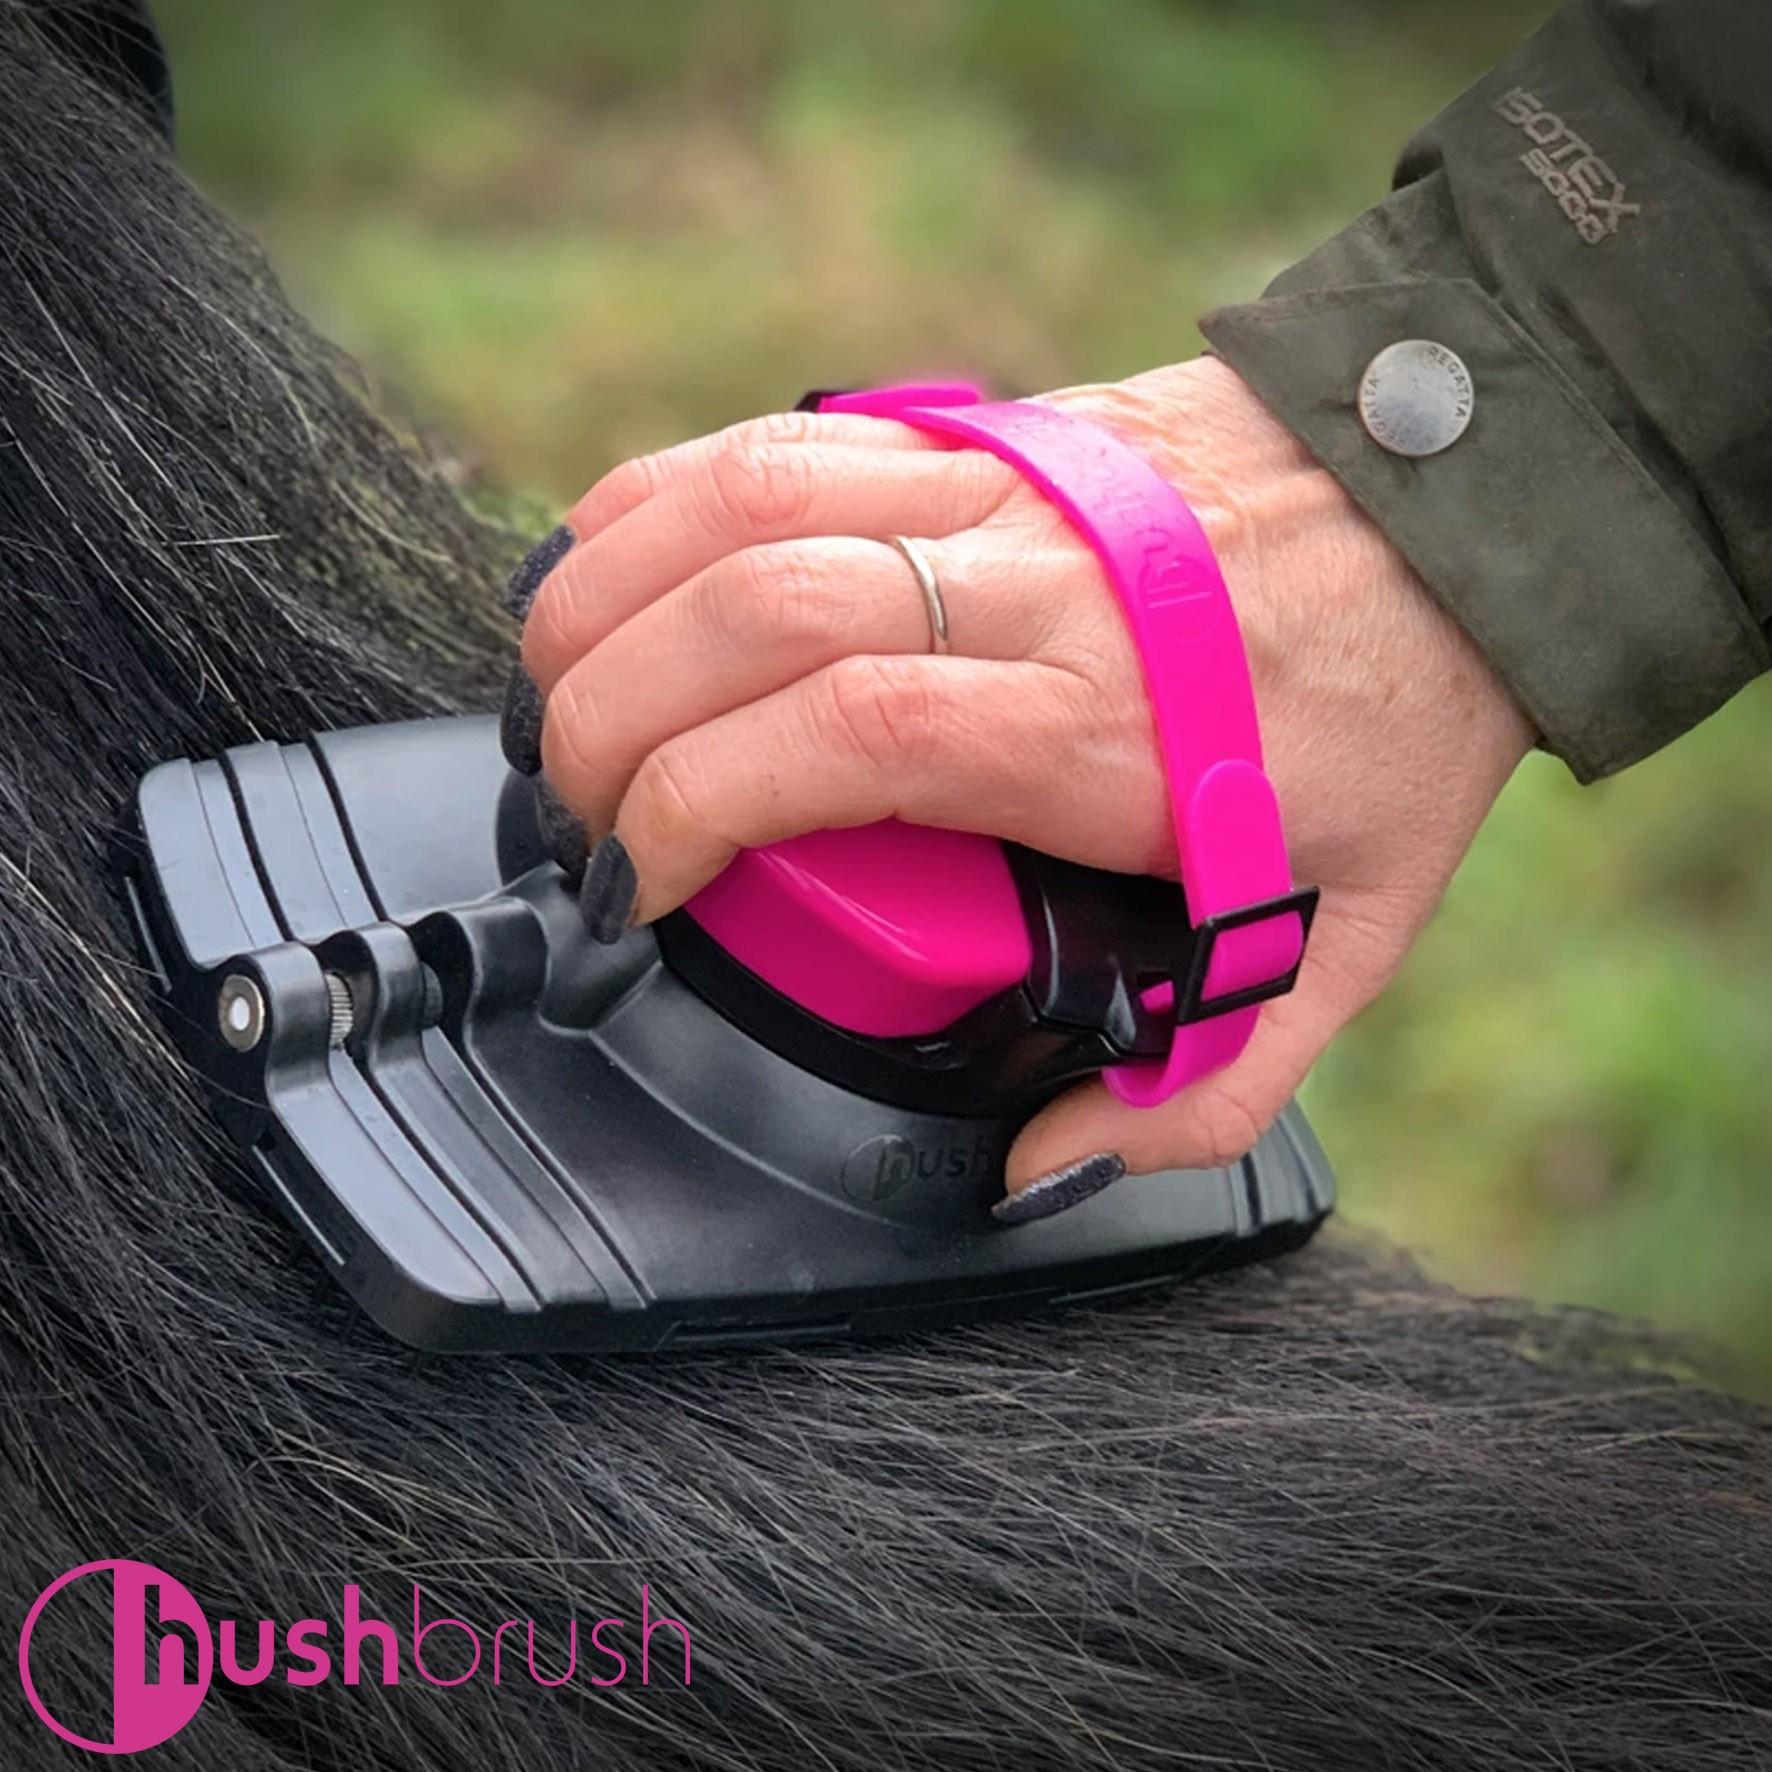 Hushbrush